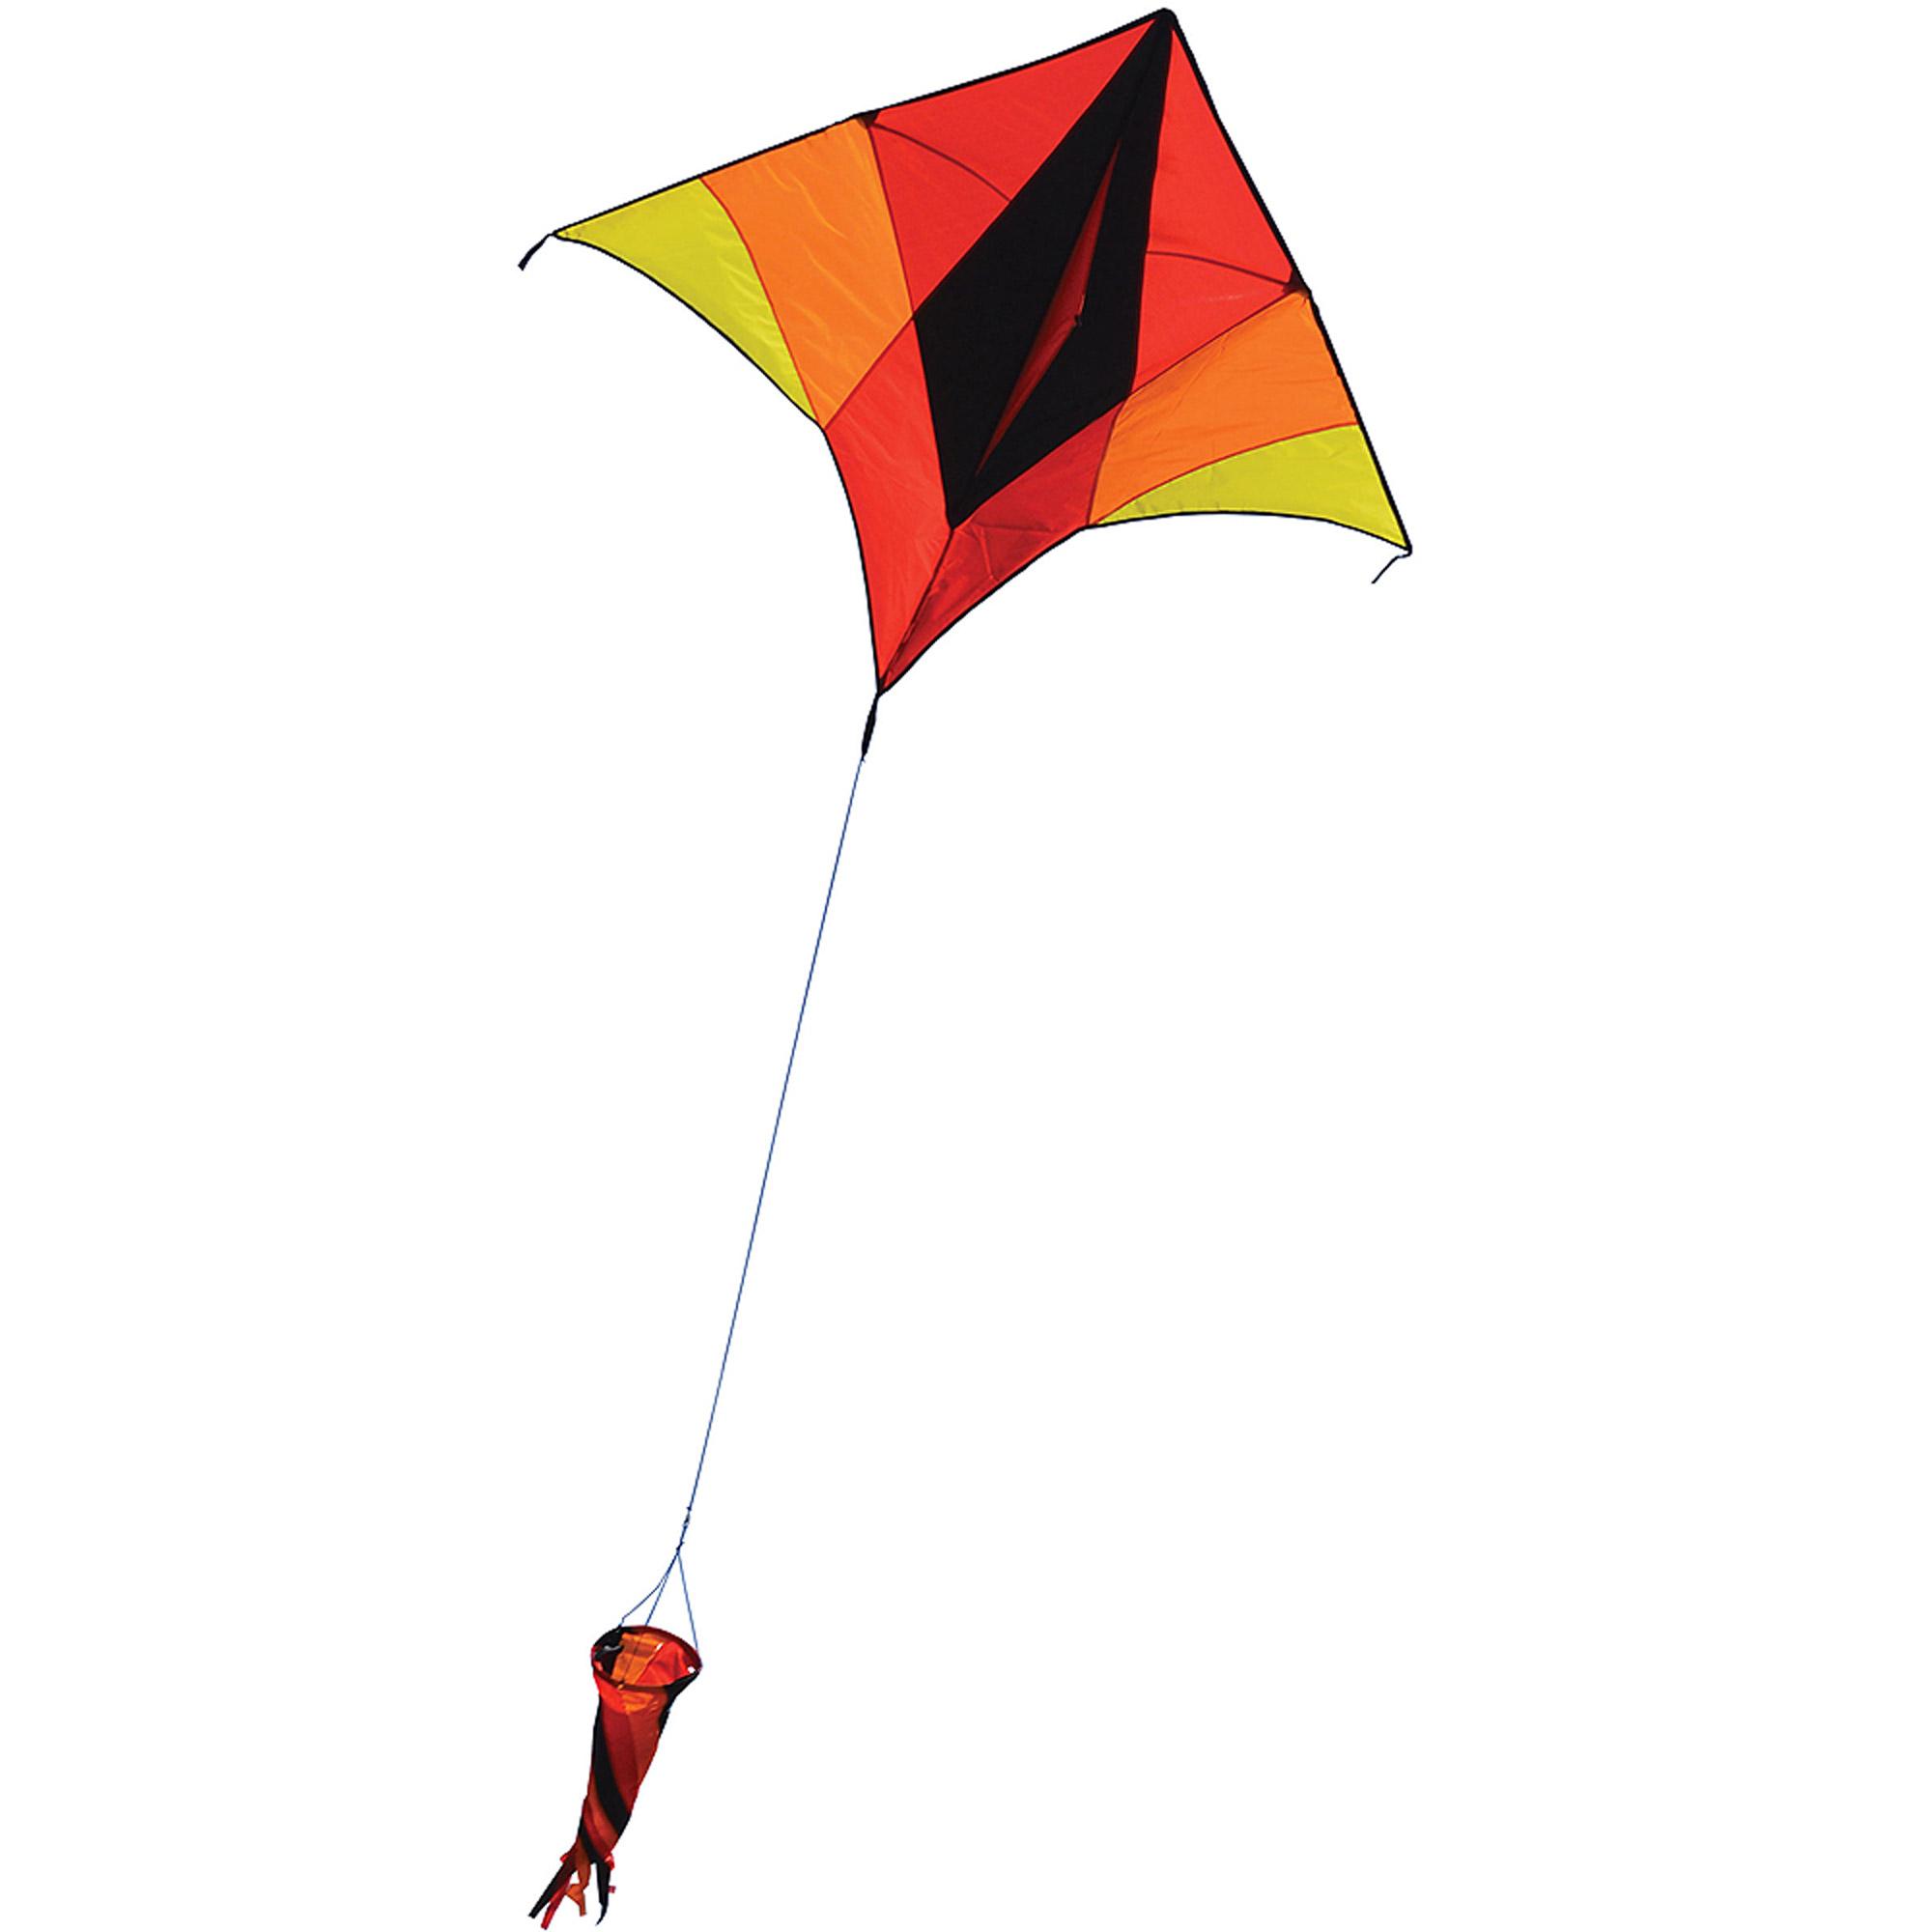 Bold Innovations Nova Delta 60 Kite, Warm